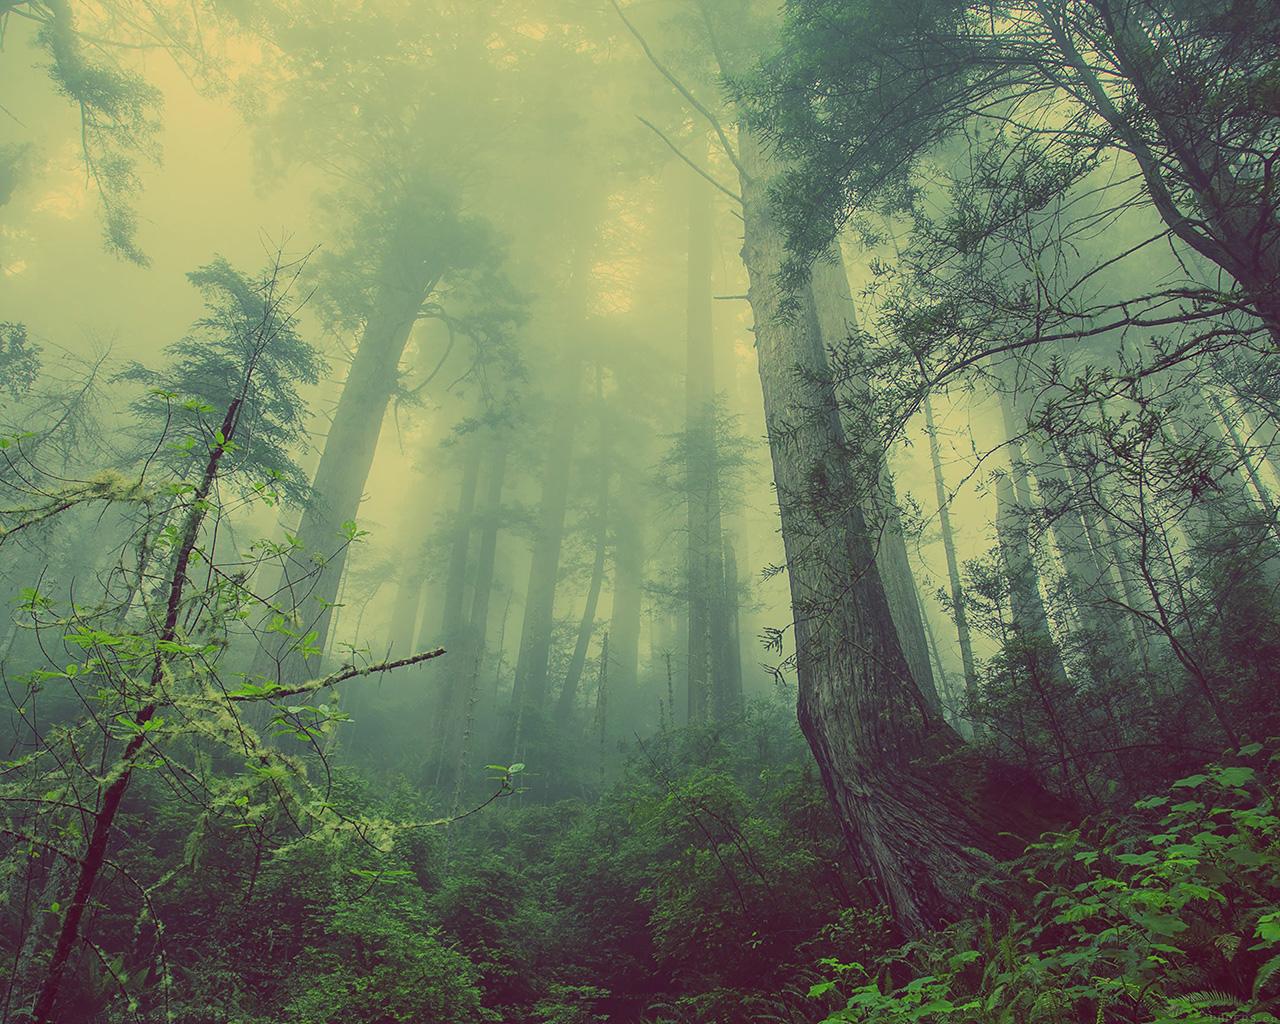 4k wallpaper nature redwoods - photo #9